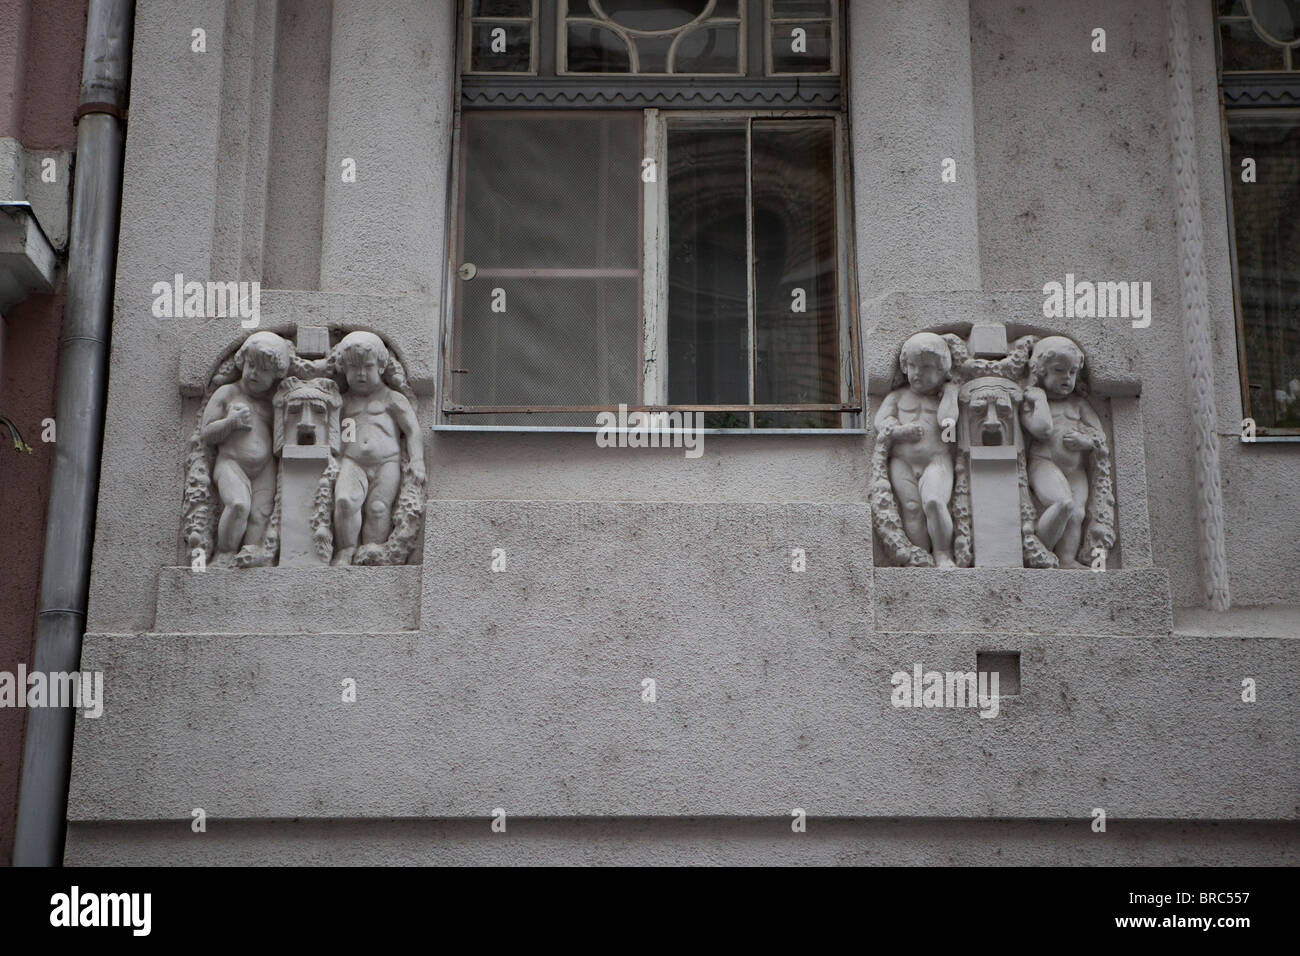 Cherubs architecture buildings Budapest Hungary - Stock Image